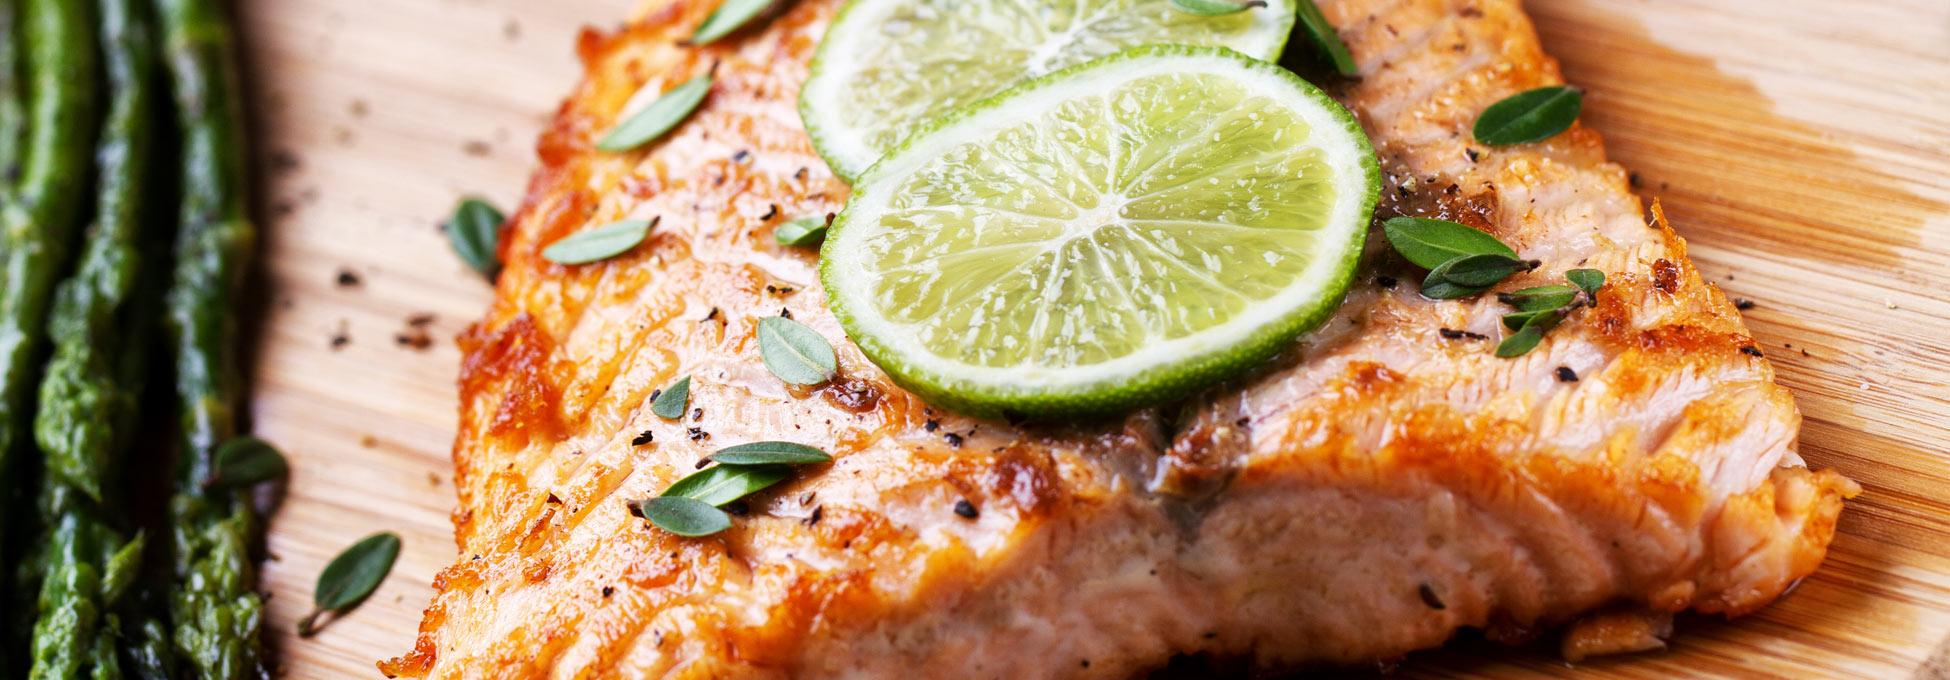 trigs-homepg-atlantic-salmon-grilled.jpg